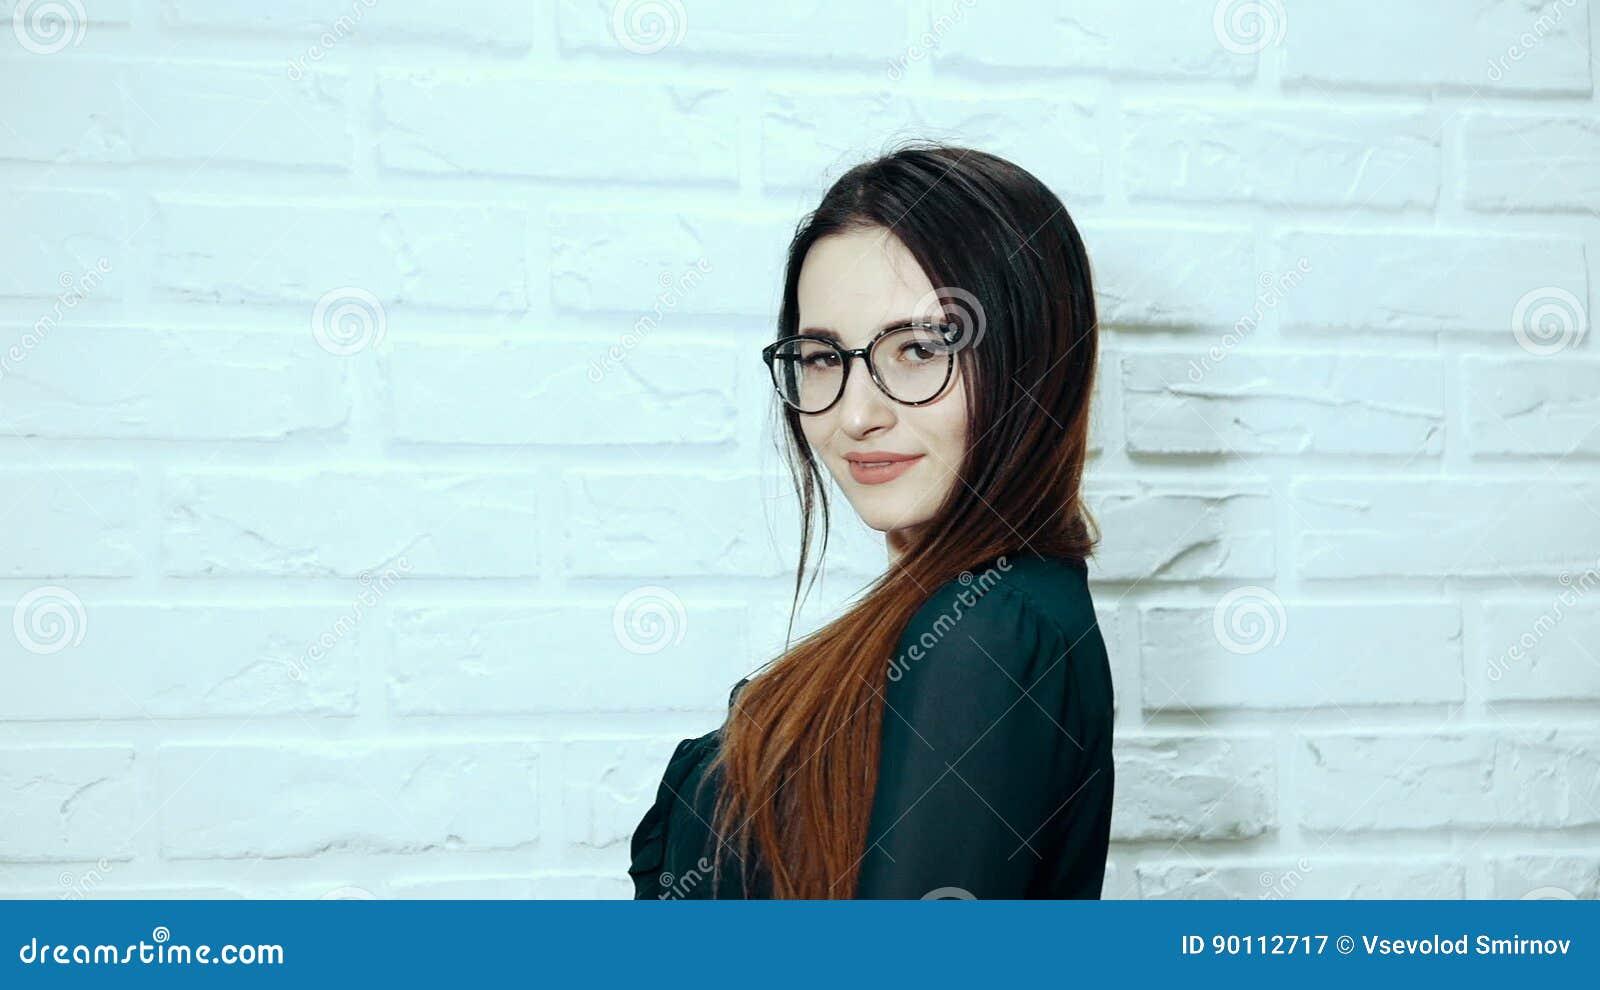 ea1f3e5aa7 A Young Woman Posing